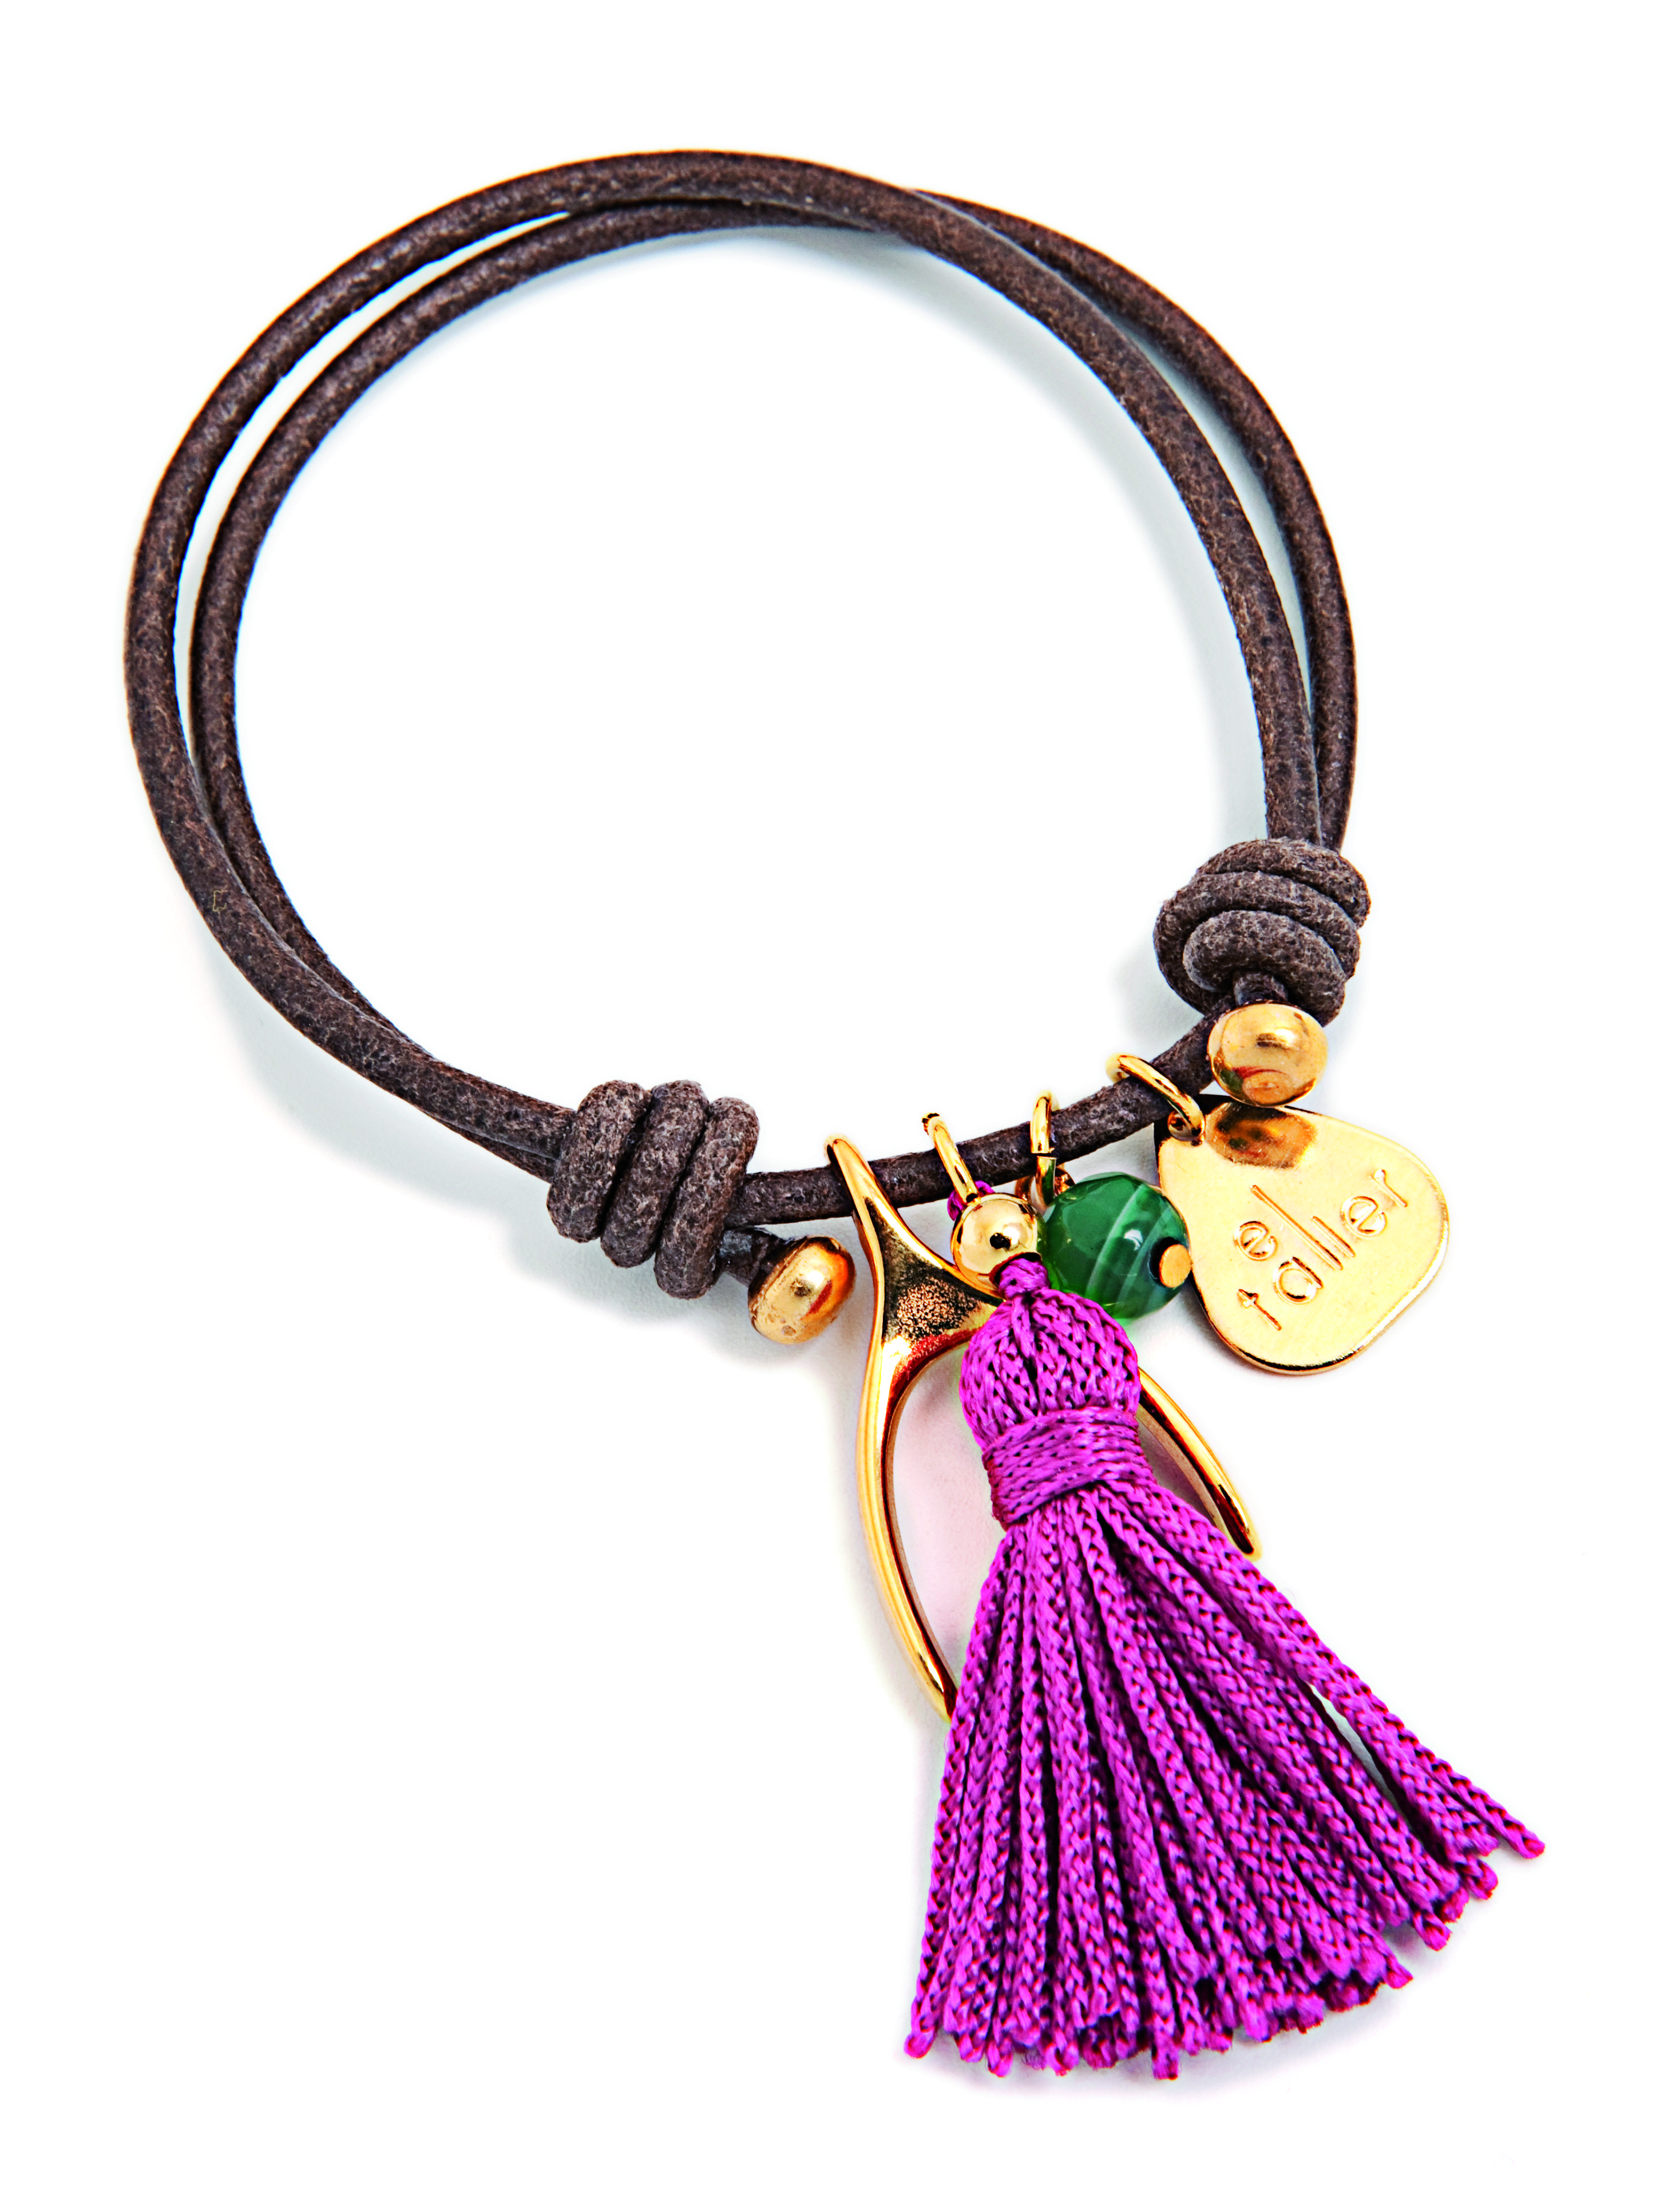 best images about biju on pinterest tassels layered bracelets